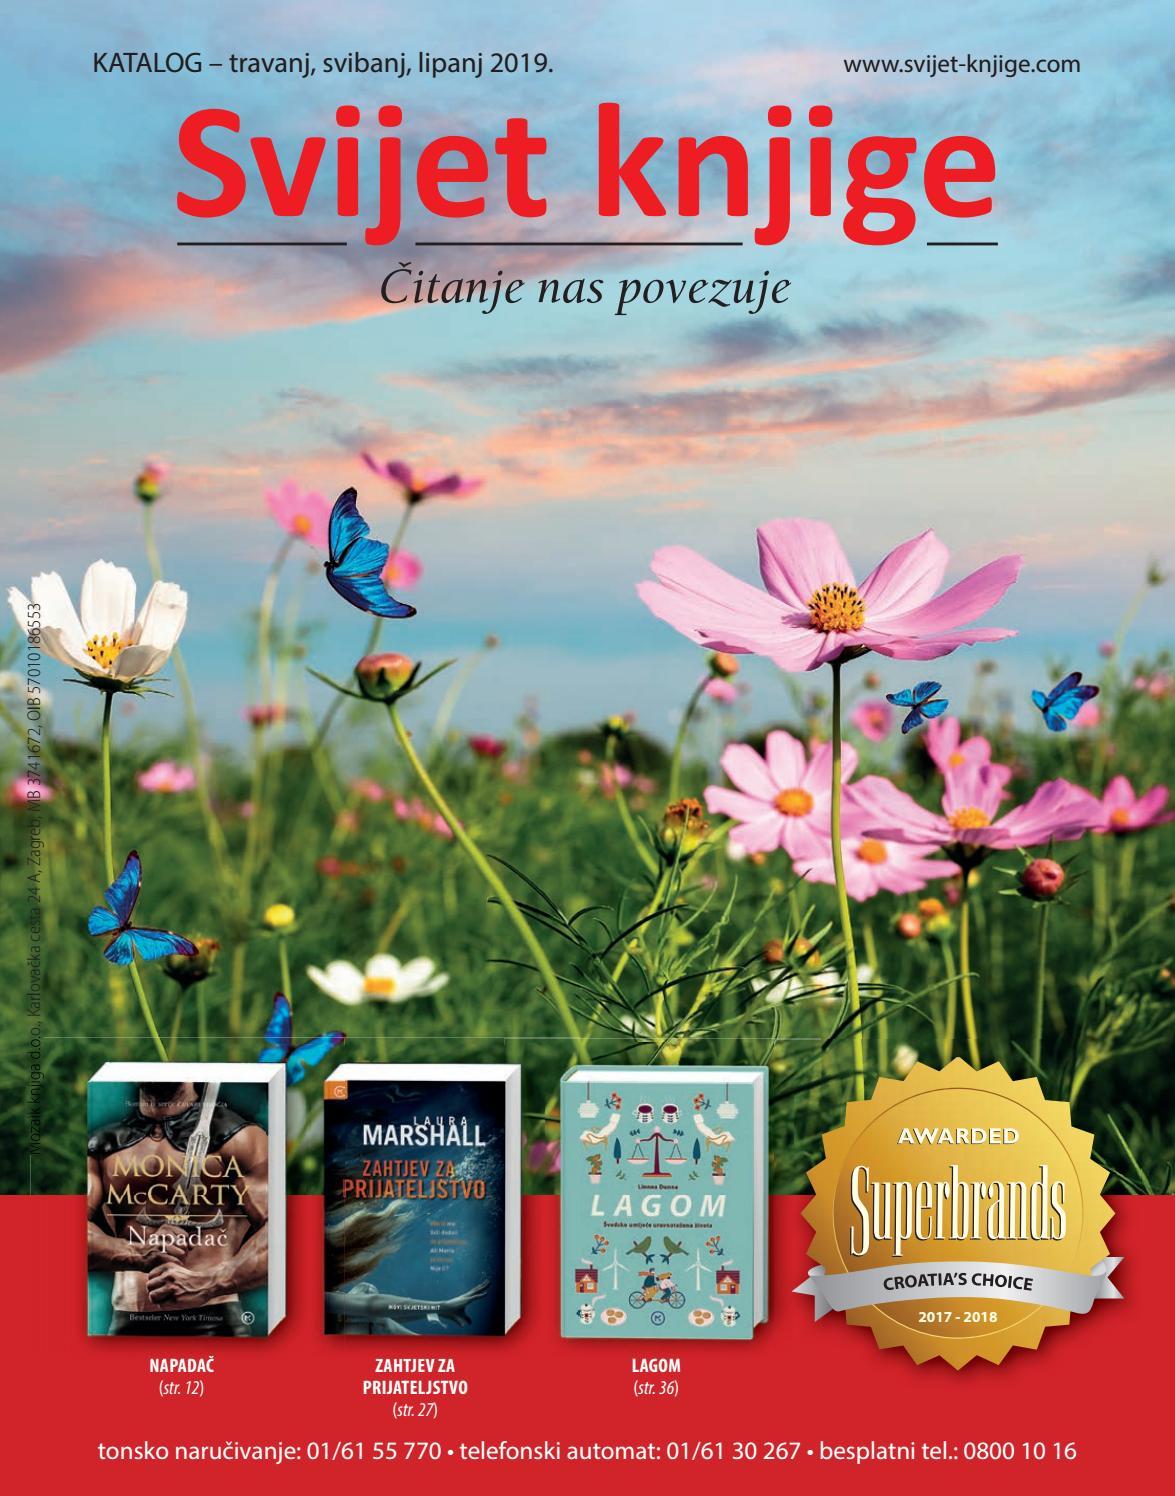 "Sila prirode"" drugi je bestseler australske spisateljice Jane Harper koja je osvojila čitatelje."